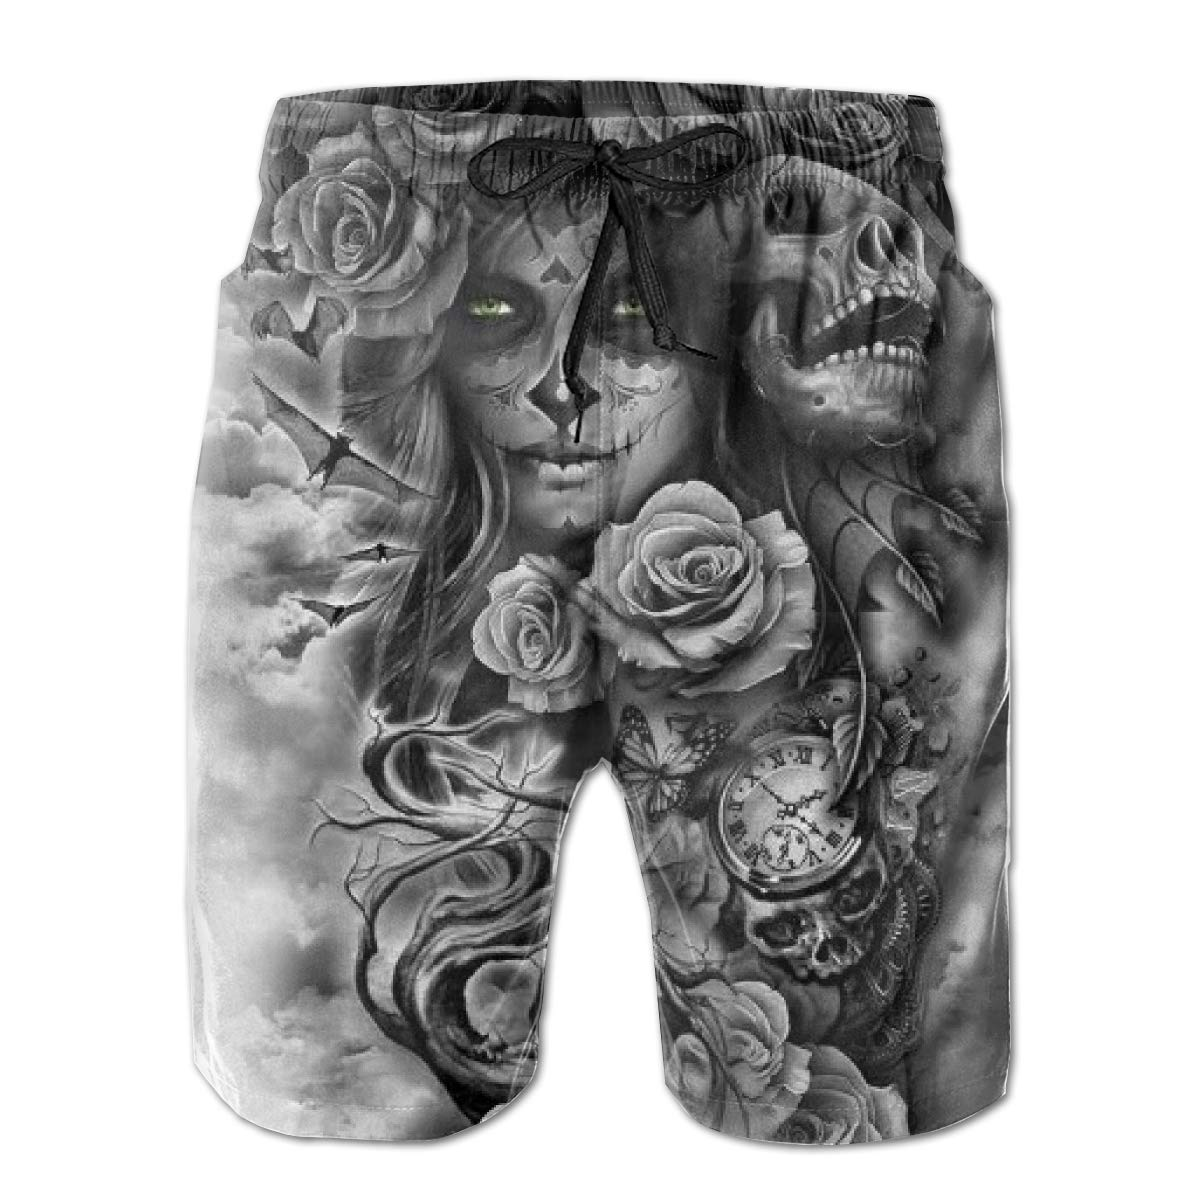 RYHT Black Suger Skull Mens Summer Beach Quick-Dry Surf Swim Trunks Boardshorts Cargo Pants